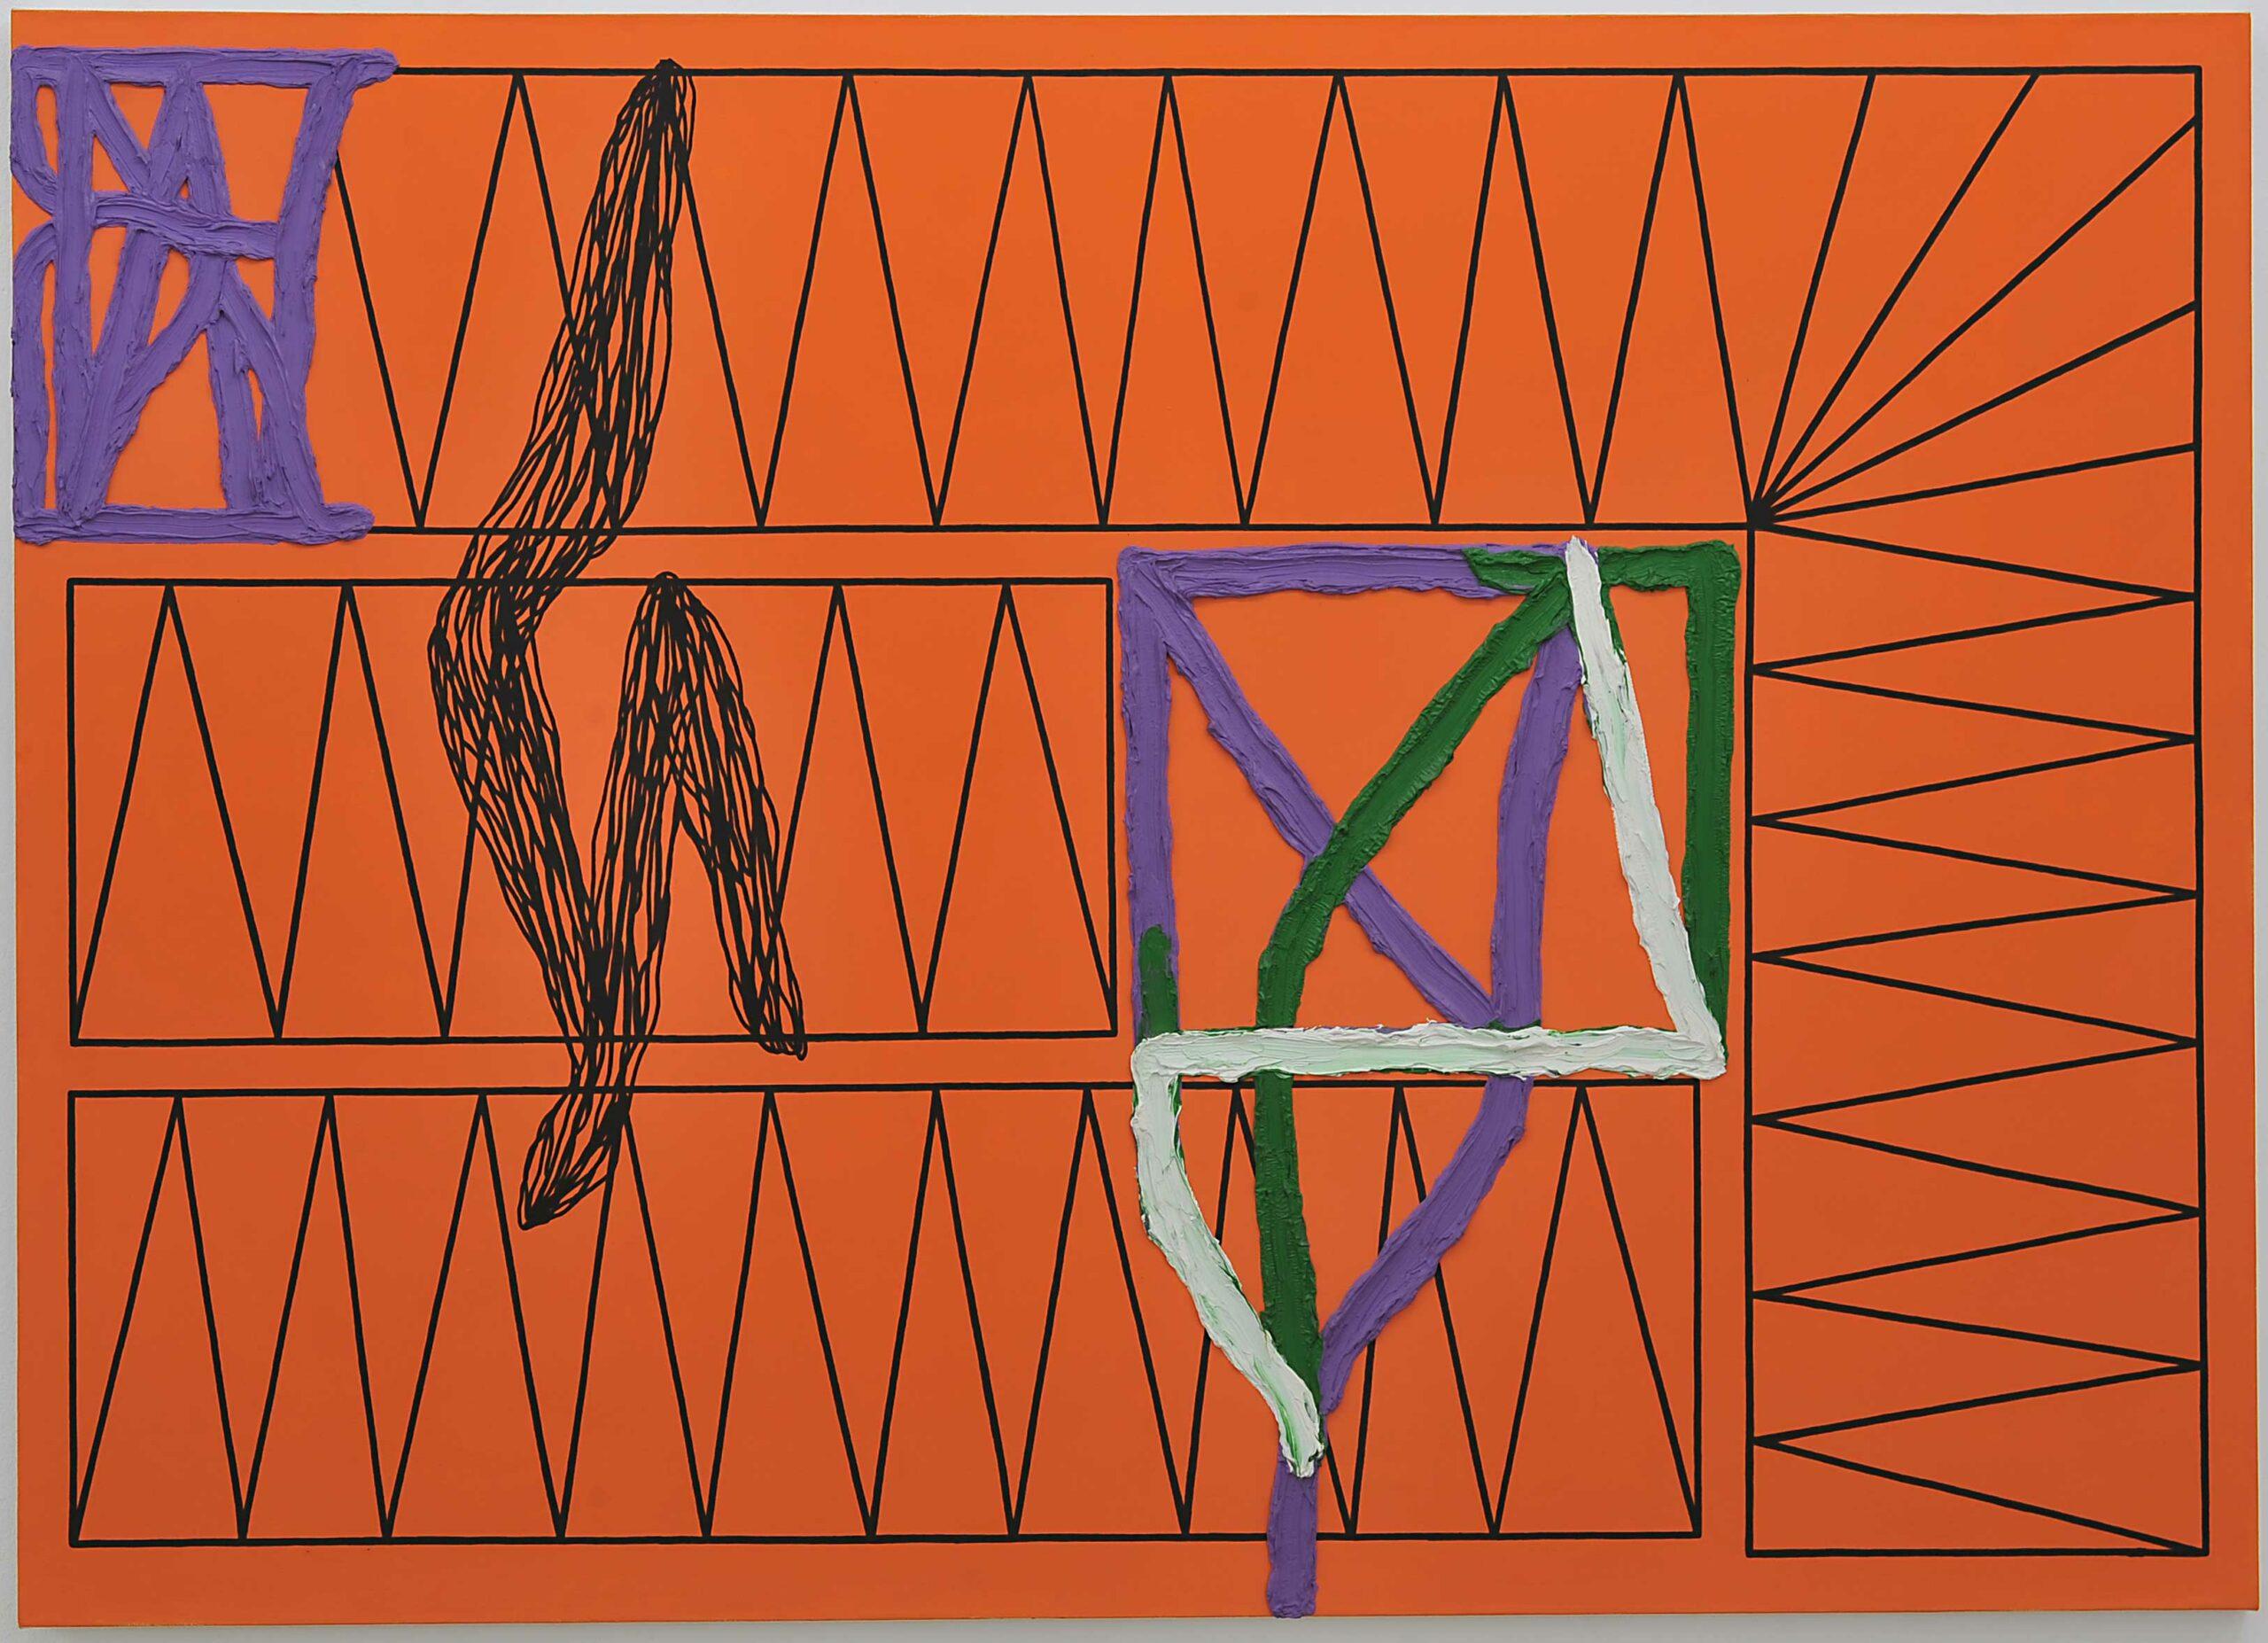 Kienzle Art Foundation Berlin, Painting by Jonathan Lasker, Kienzle Collection